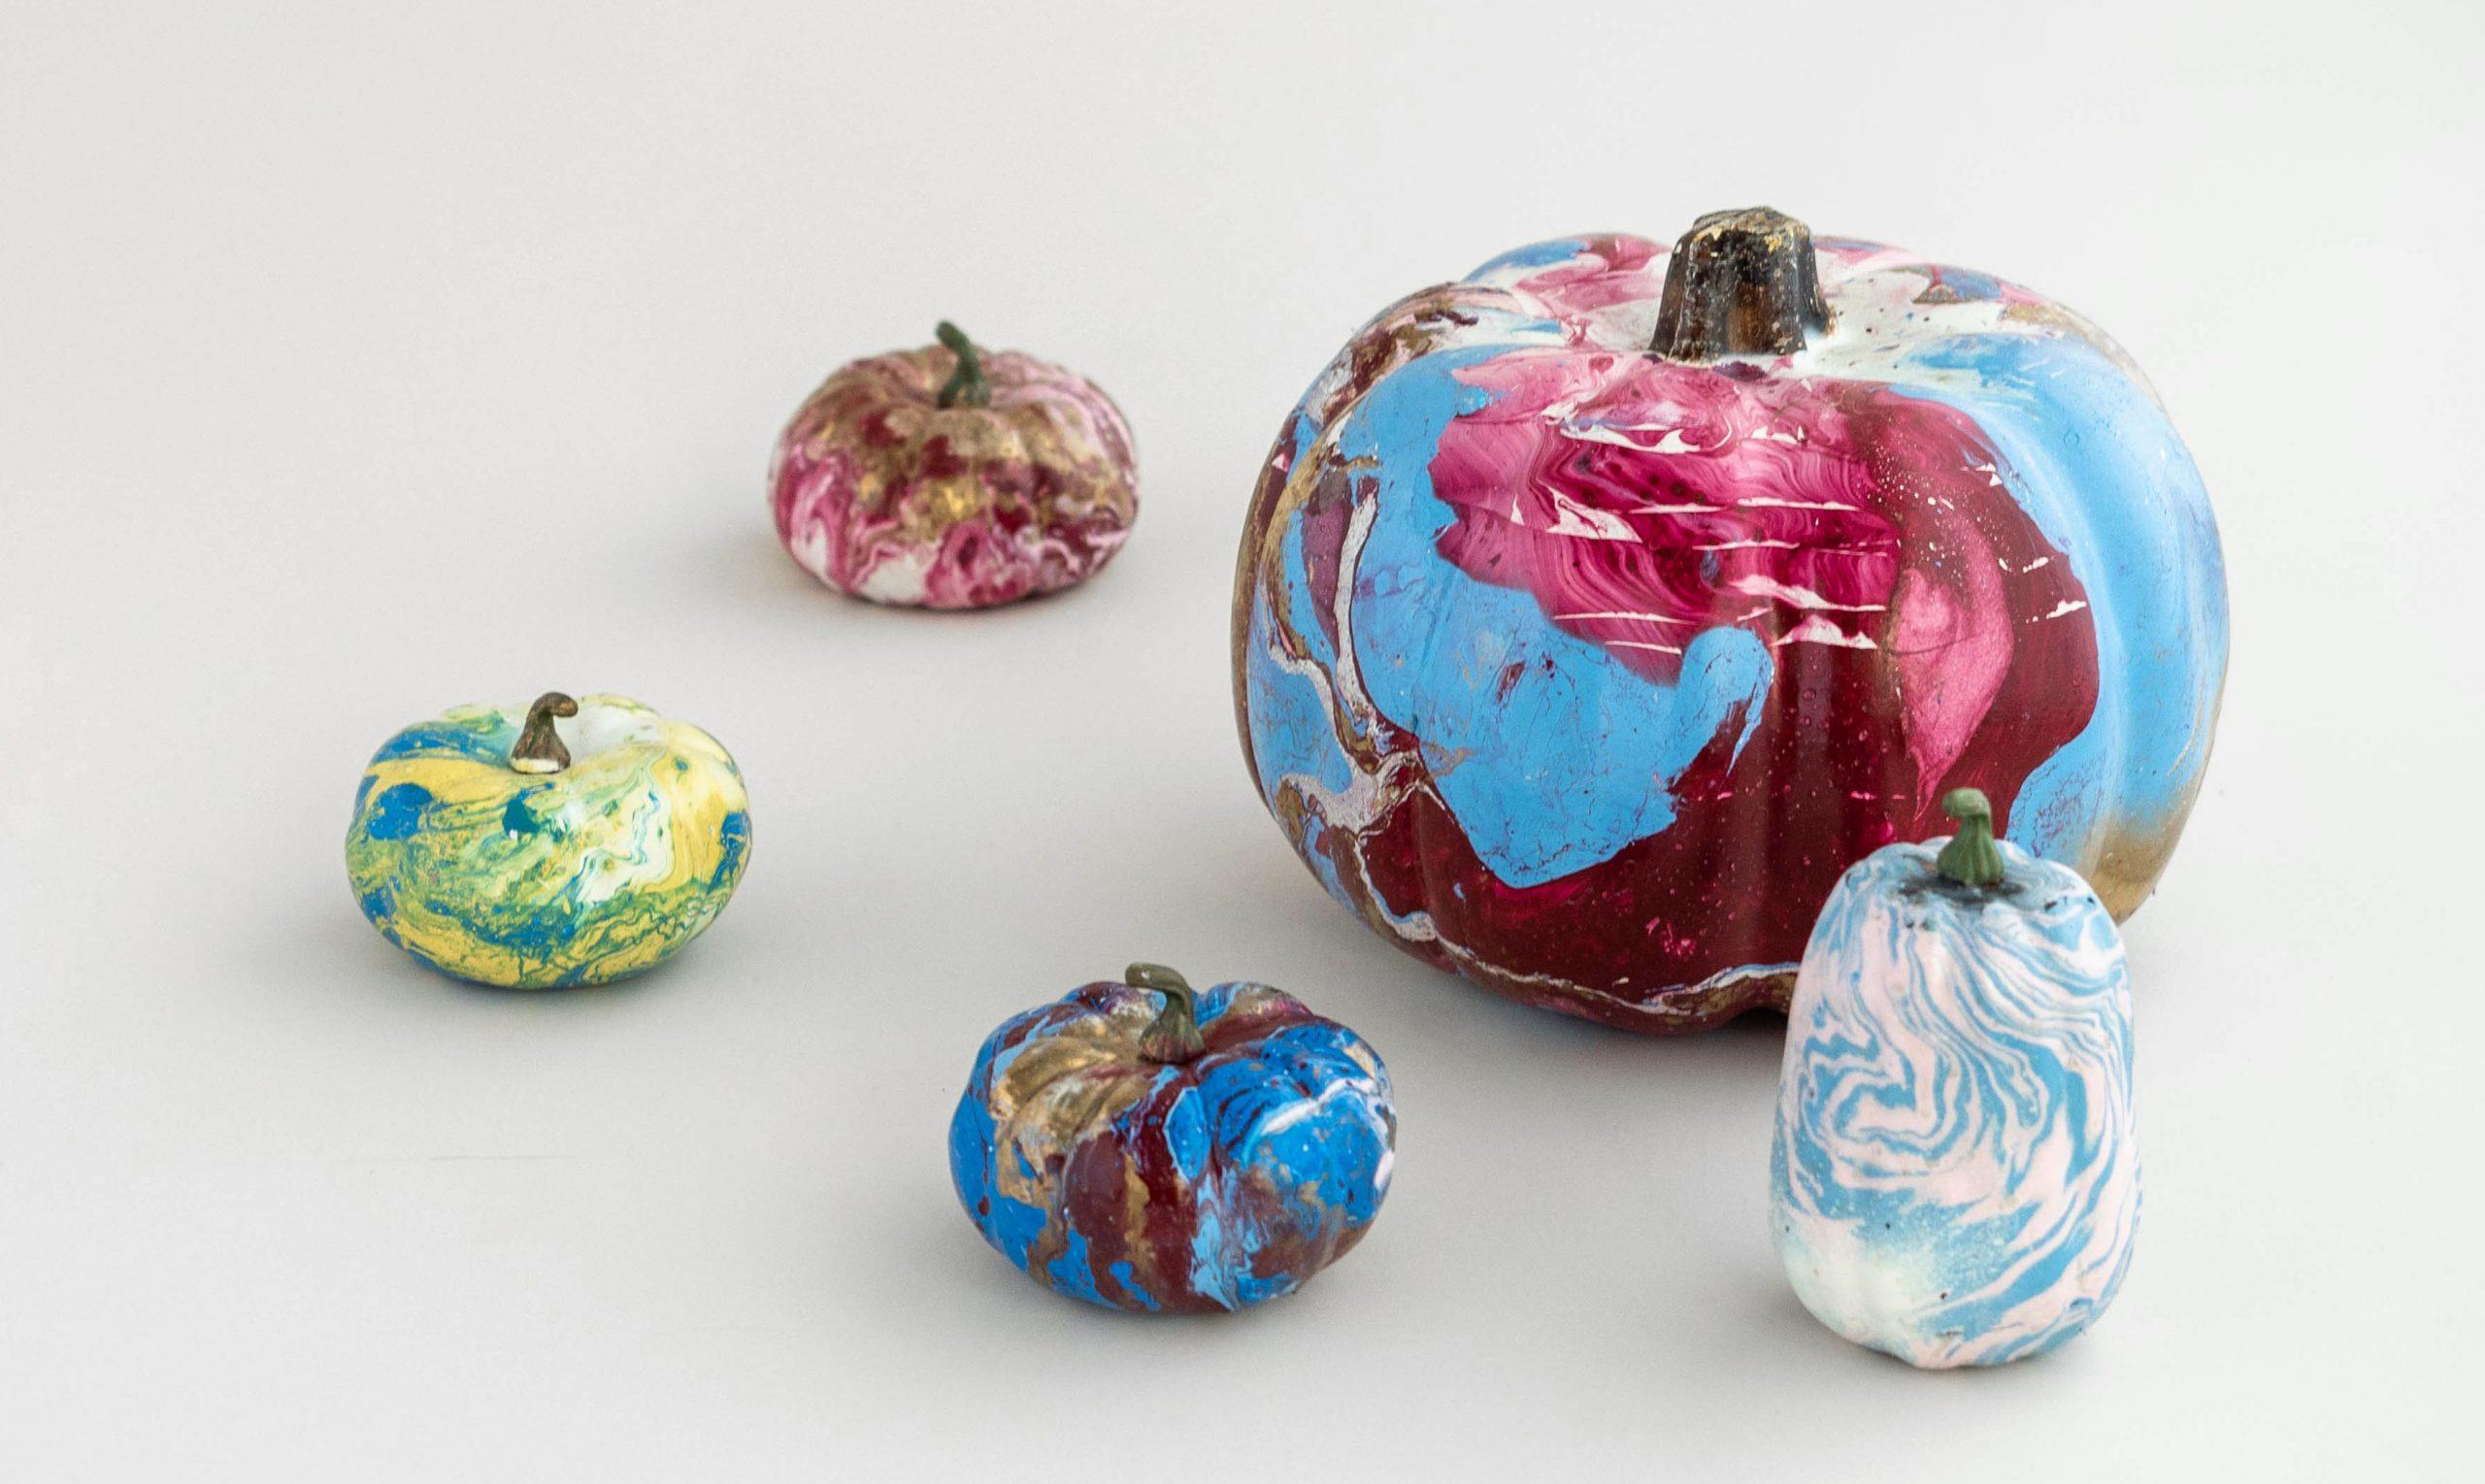 faux-marble painted pumpkins